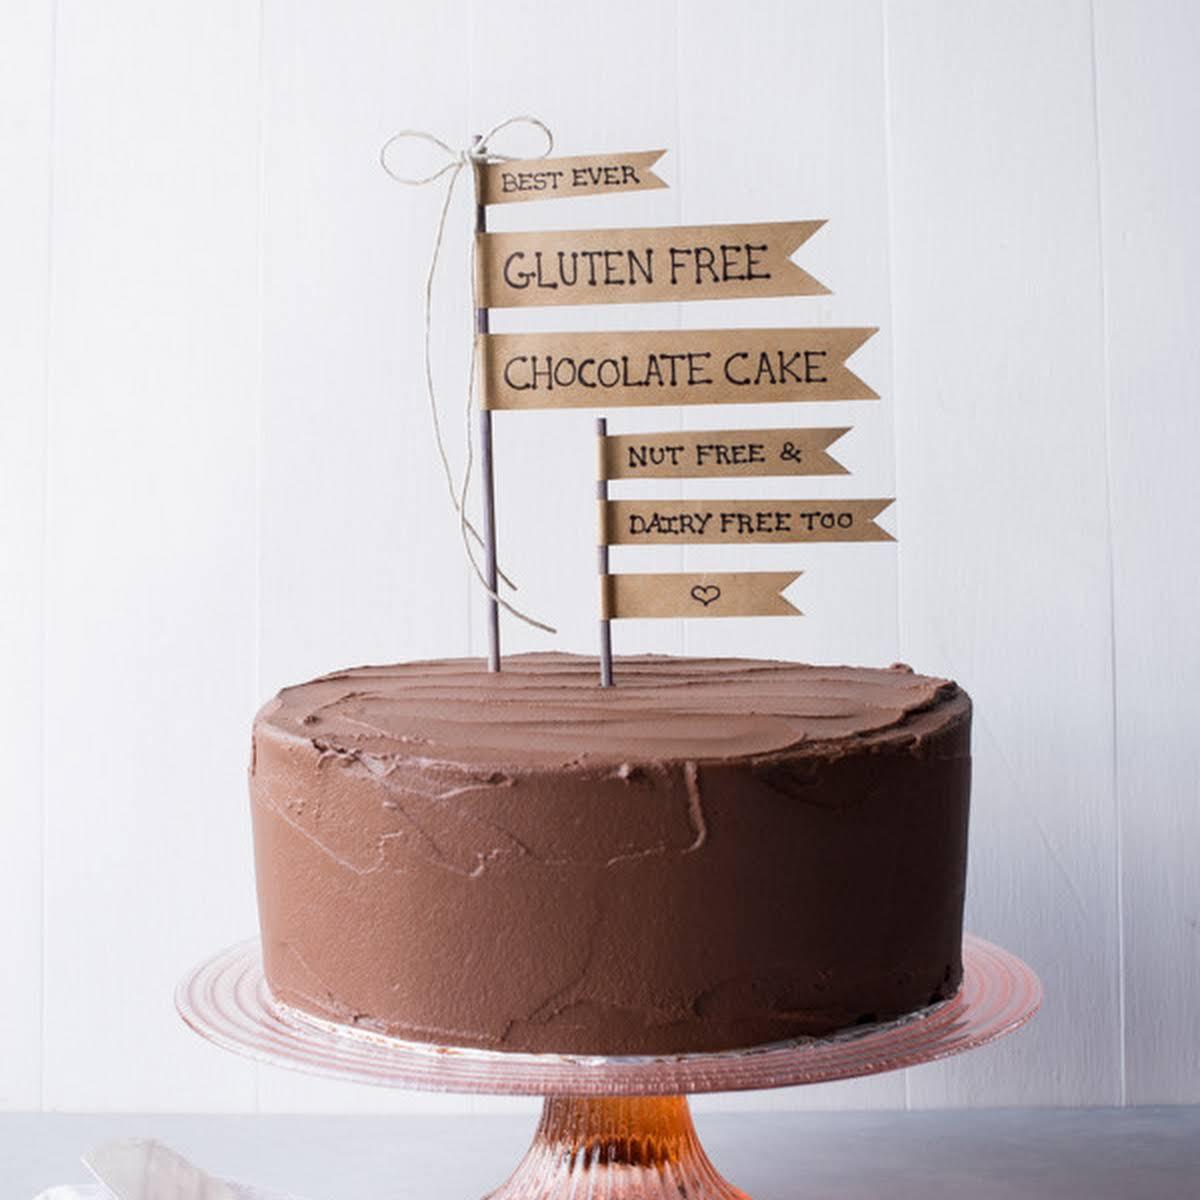 Best Ever Gluten Free Chocolate Cake